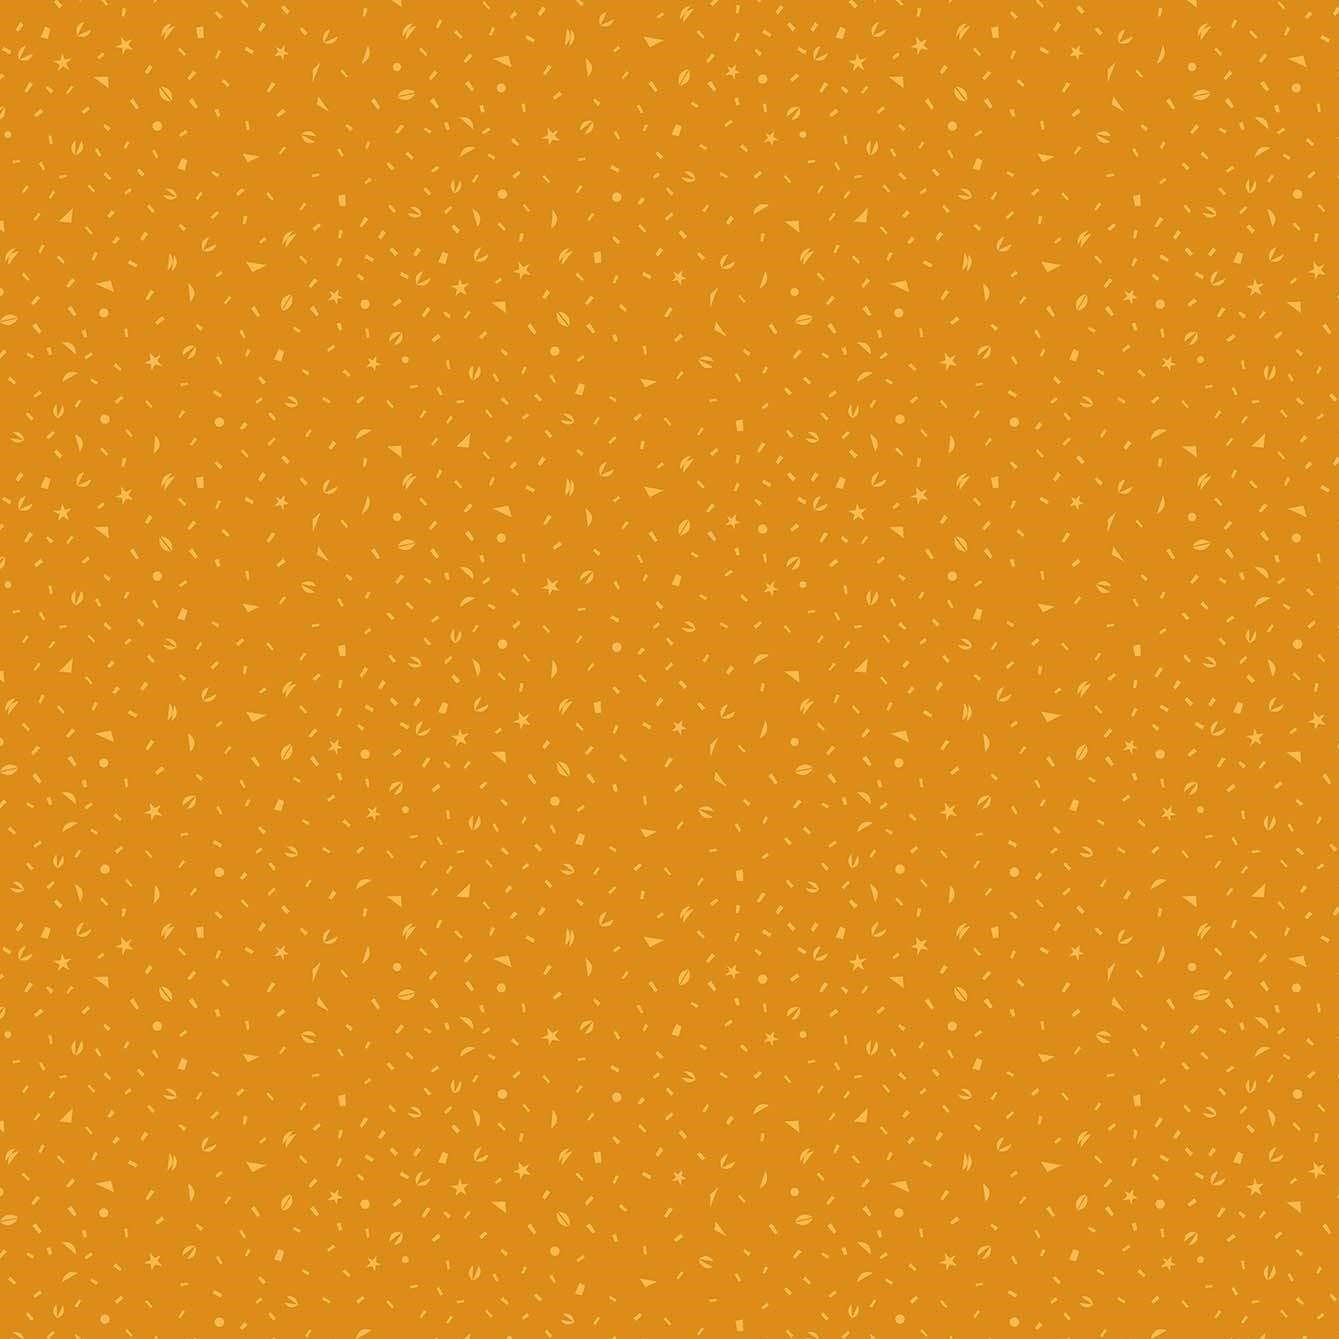 Confetti Mustard from the Tropical Jammin' collection by Figo Fabrics, 100% cotton fabric